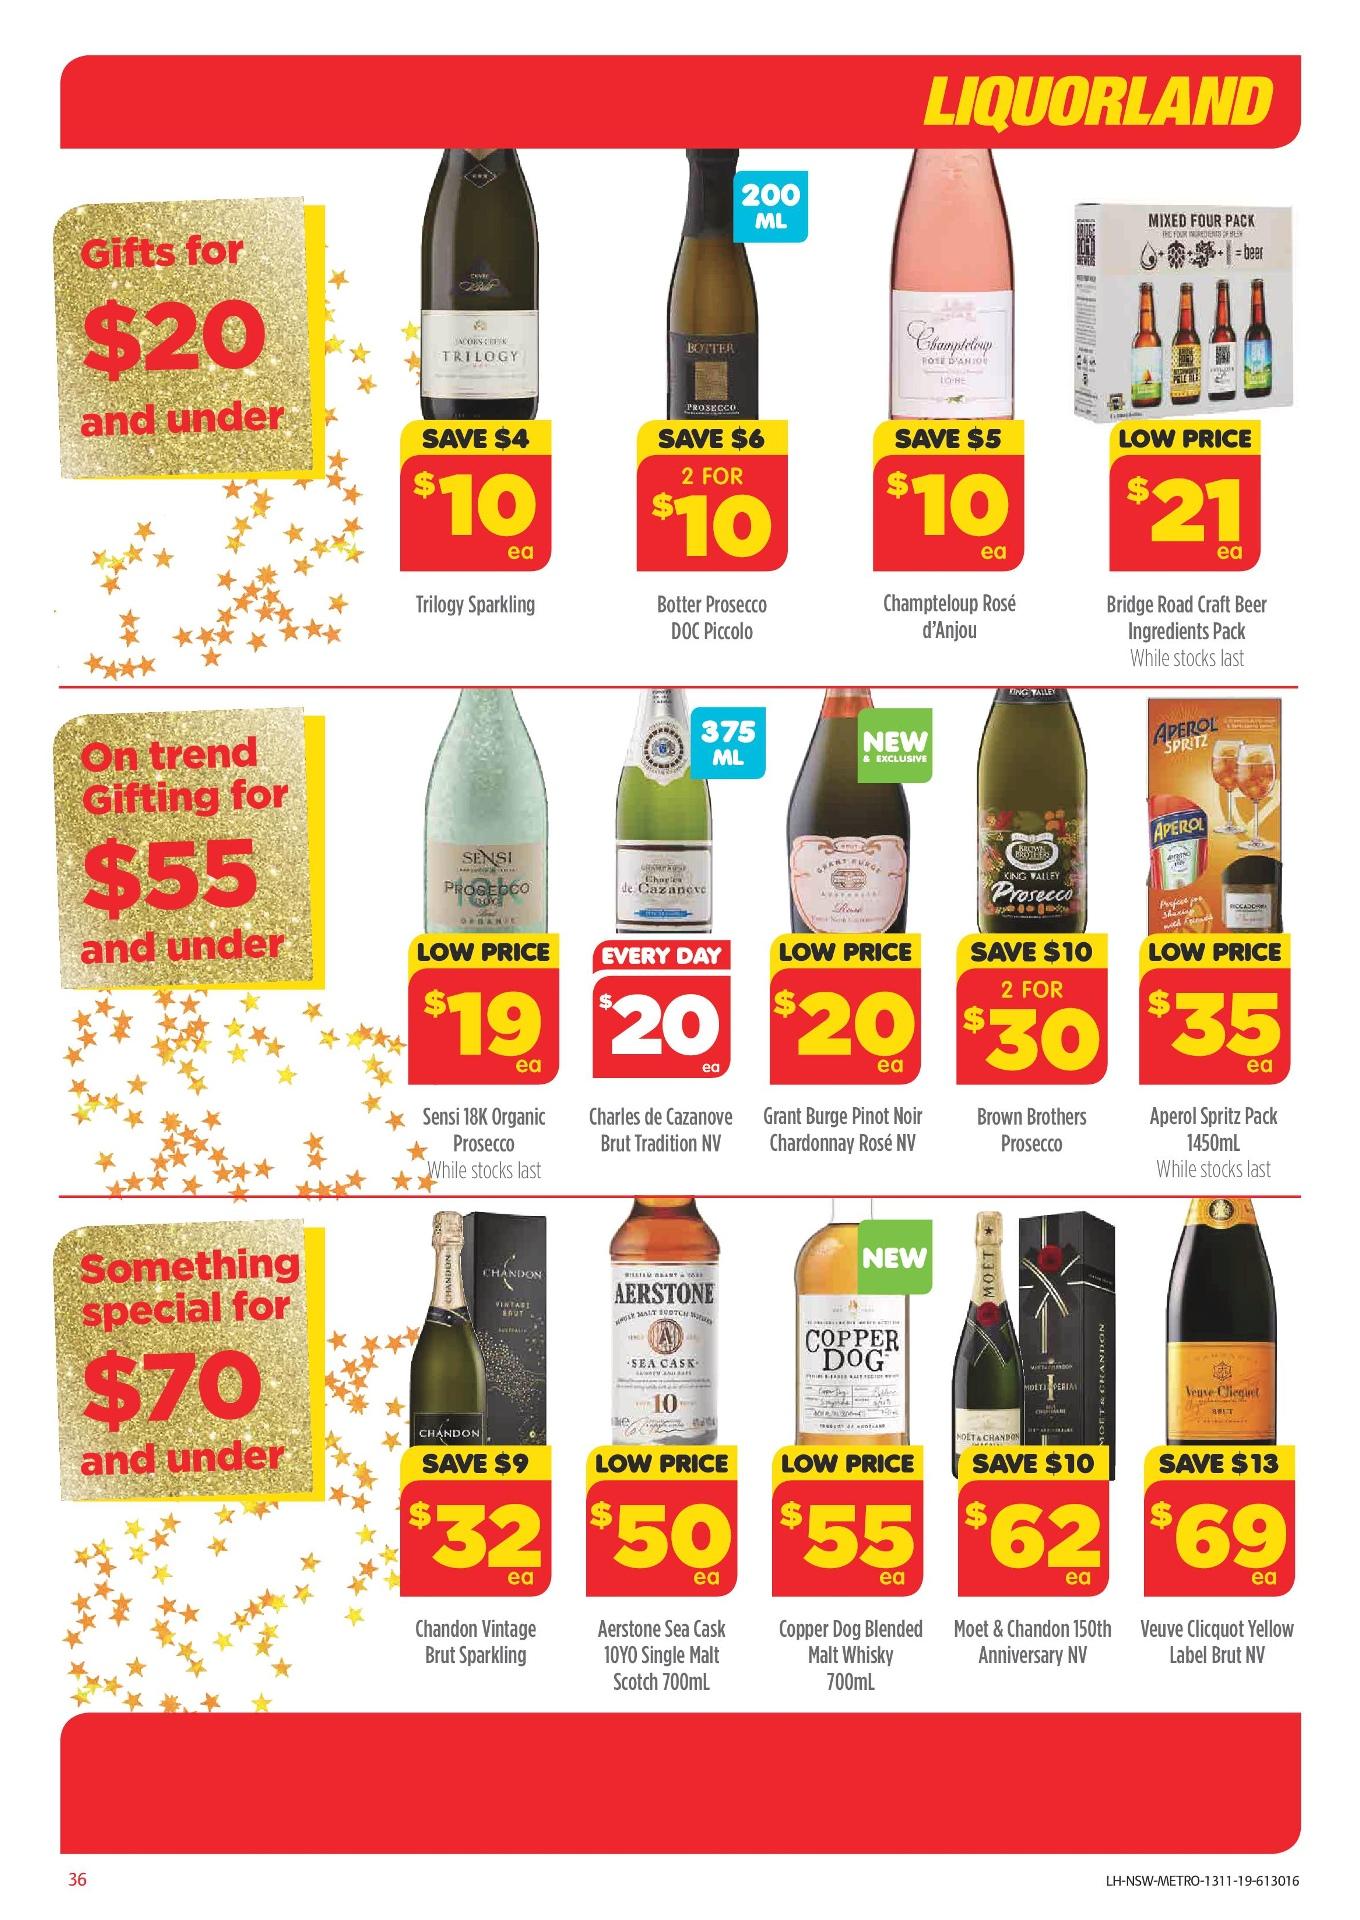 Liquorland Catalogue 13 November - 19 November 2019